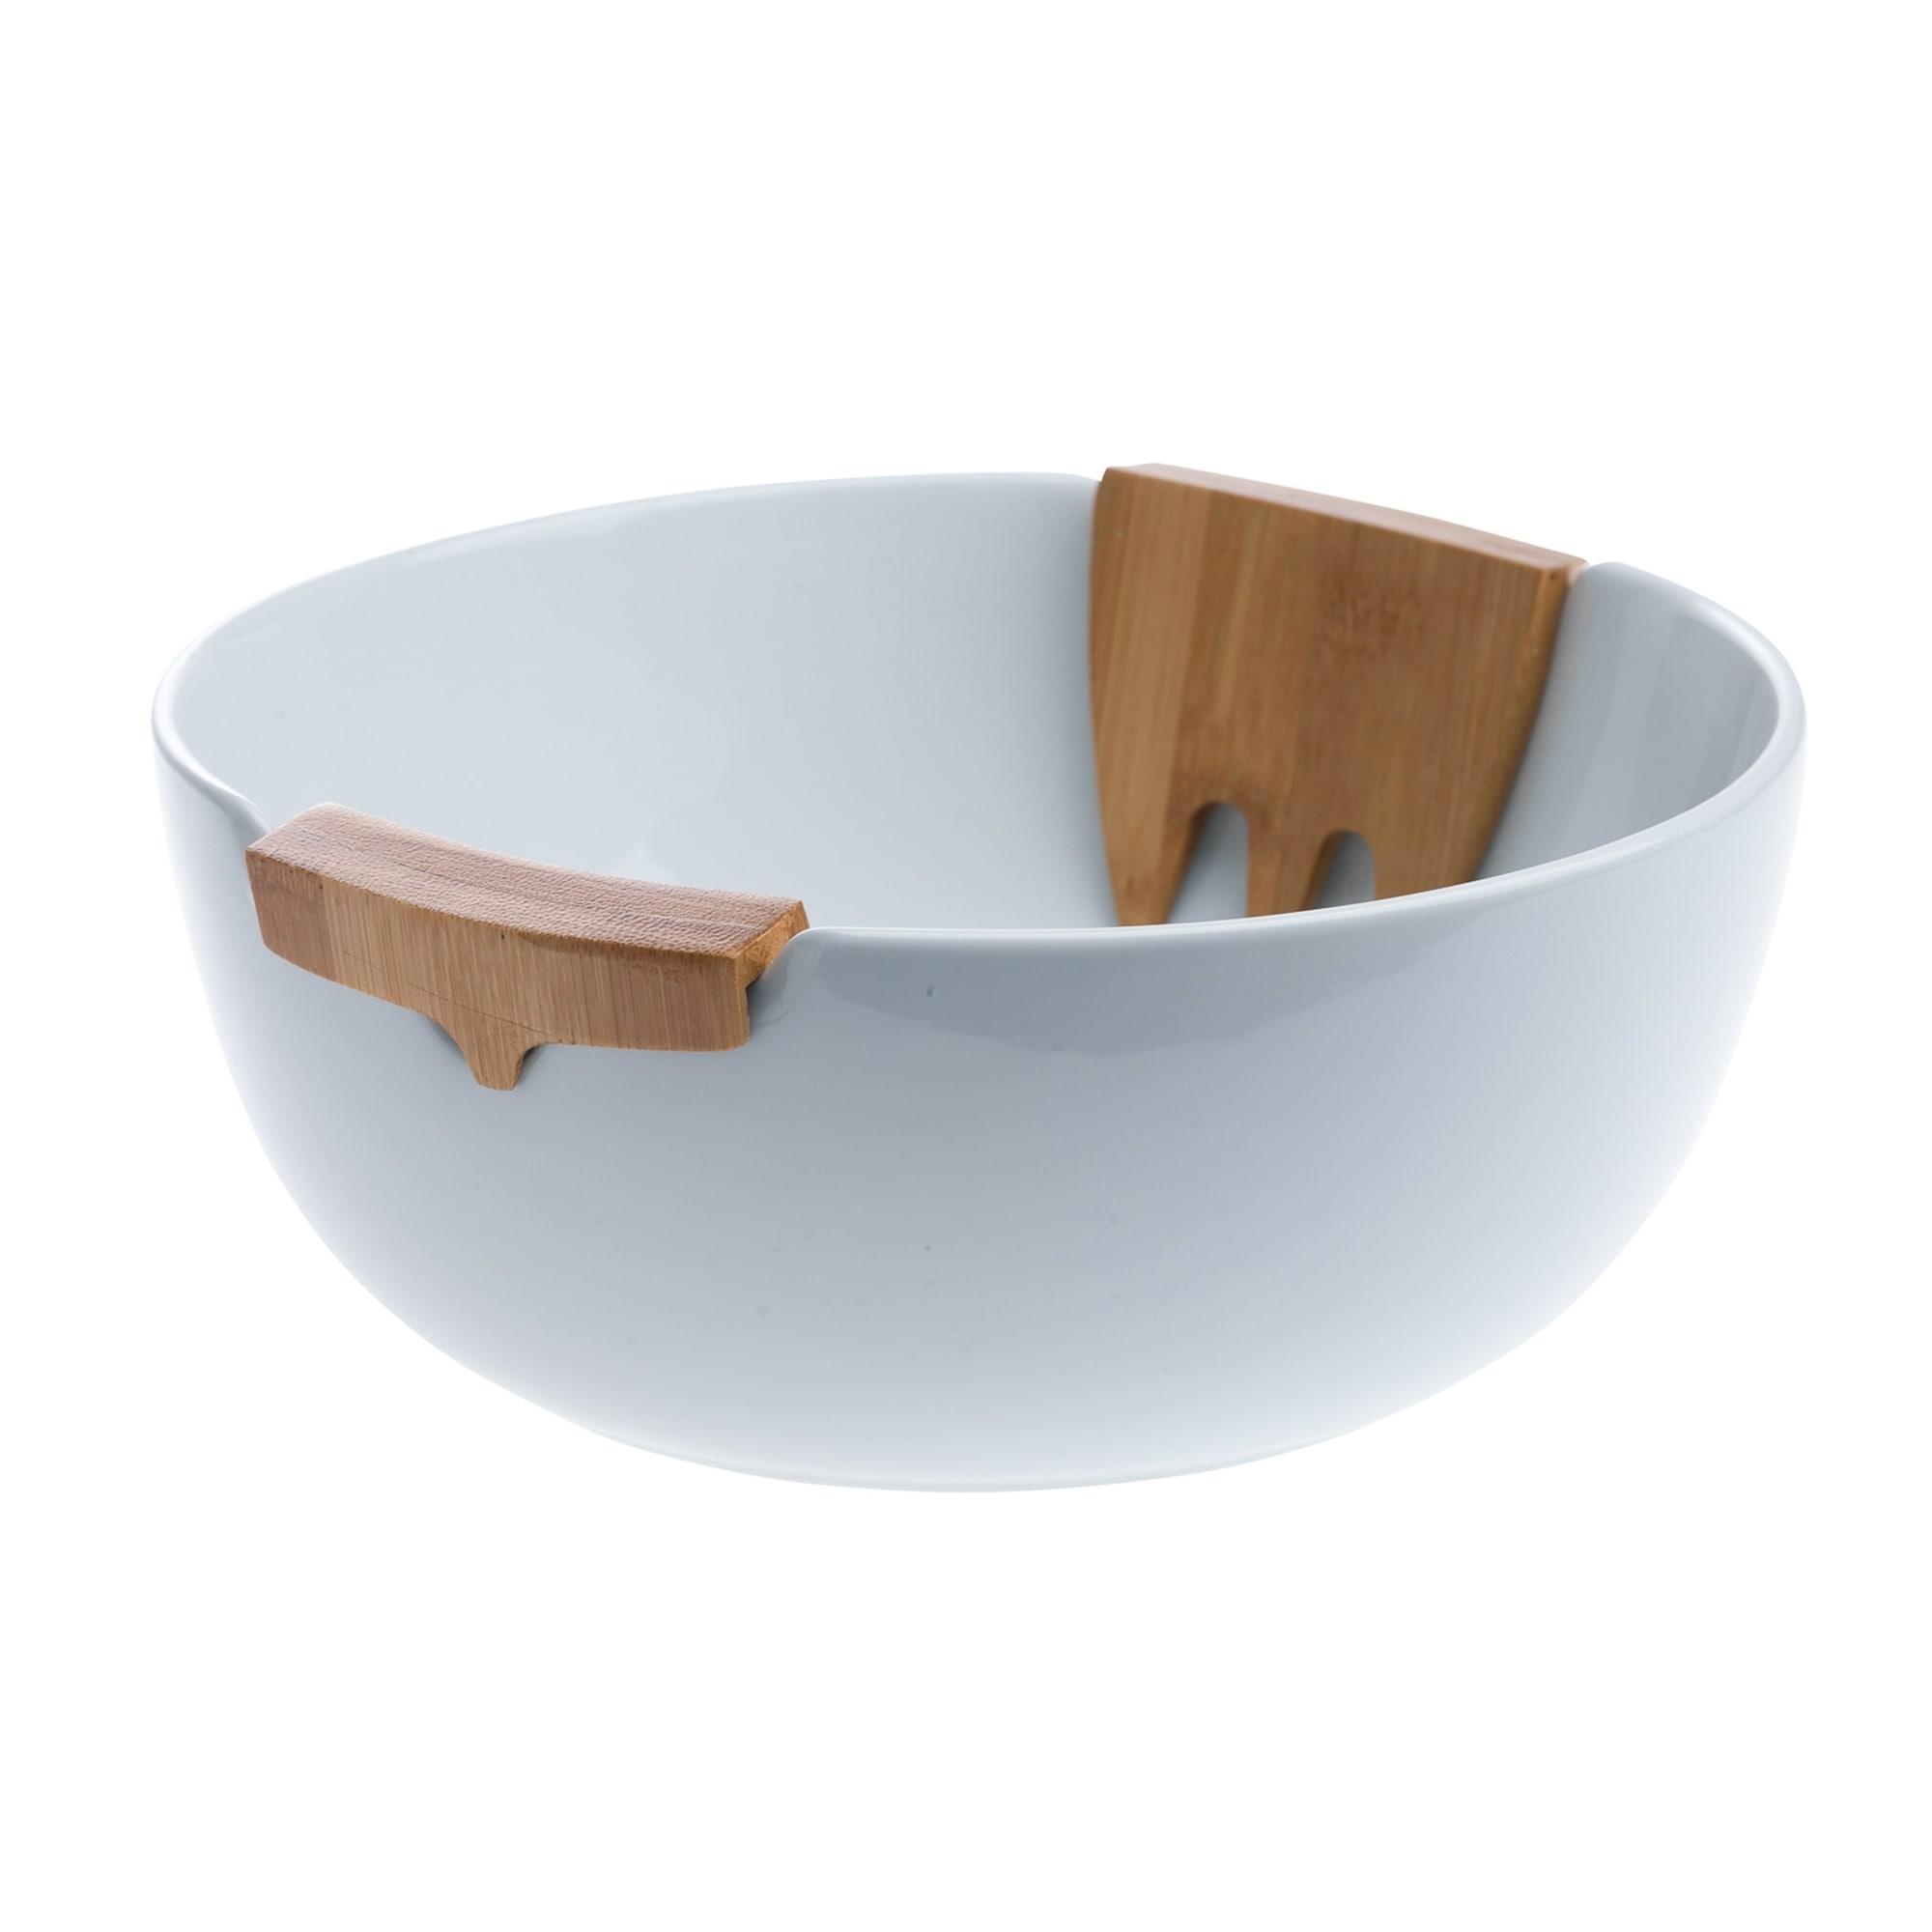 3pc Bamboo Ceramic Salad Set Overstock 22733955